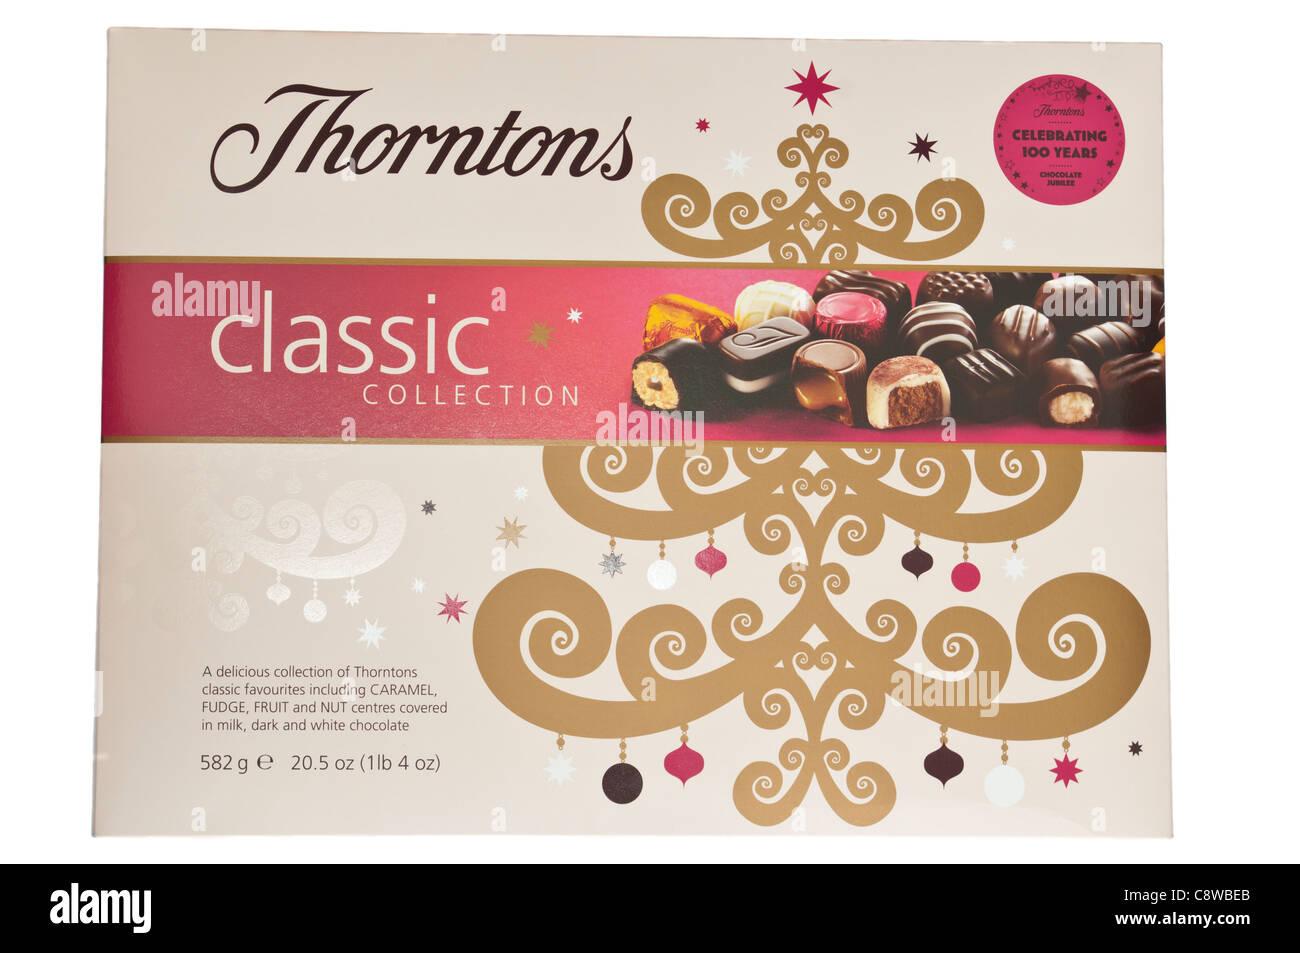 Box Of Thorntons Chocolates - Stock Image